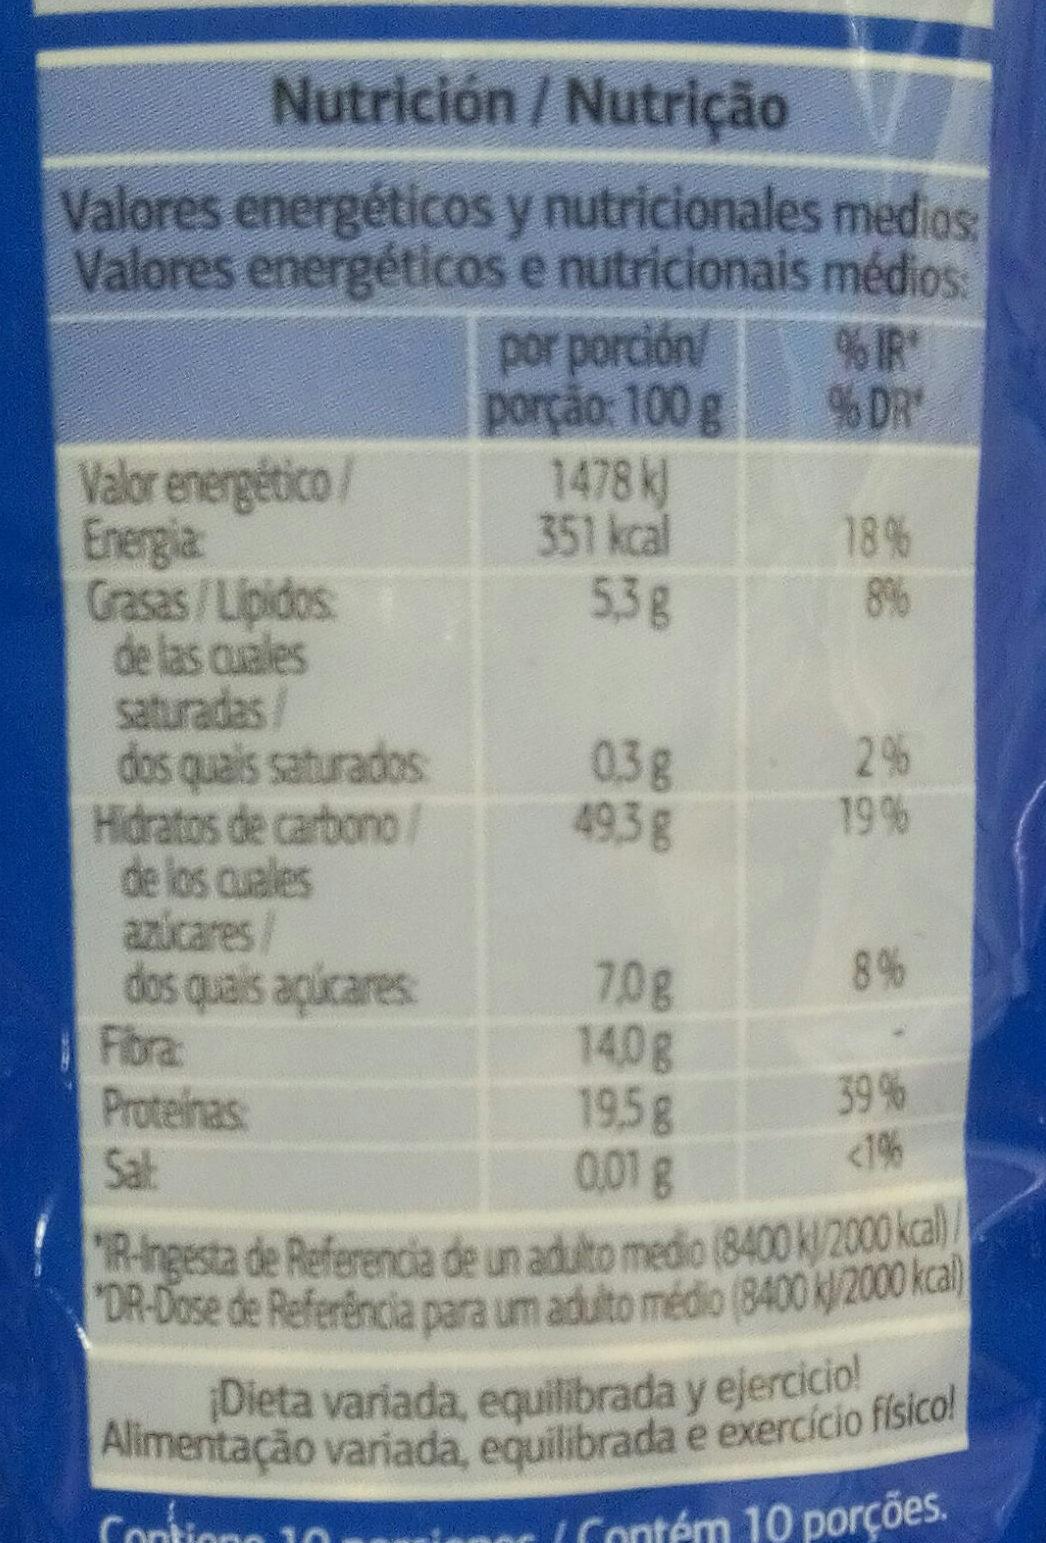 Dieta de 2000 kcal por dia